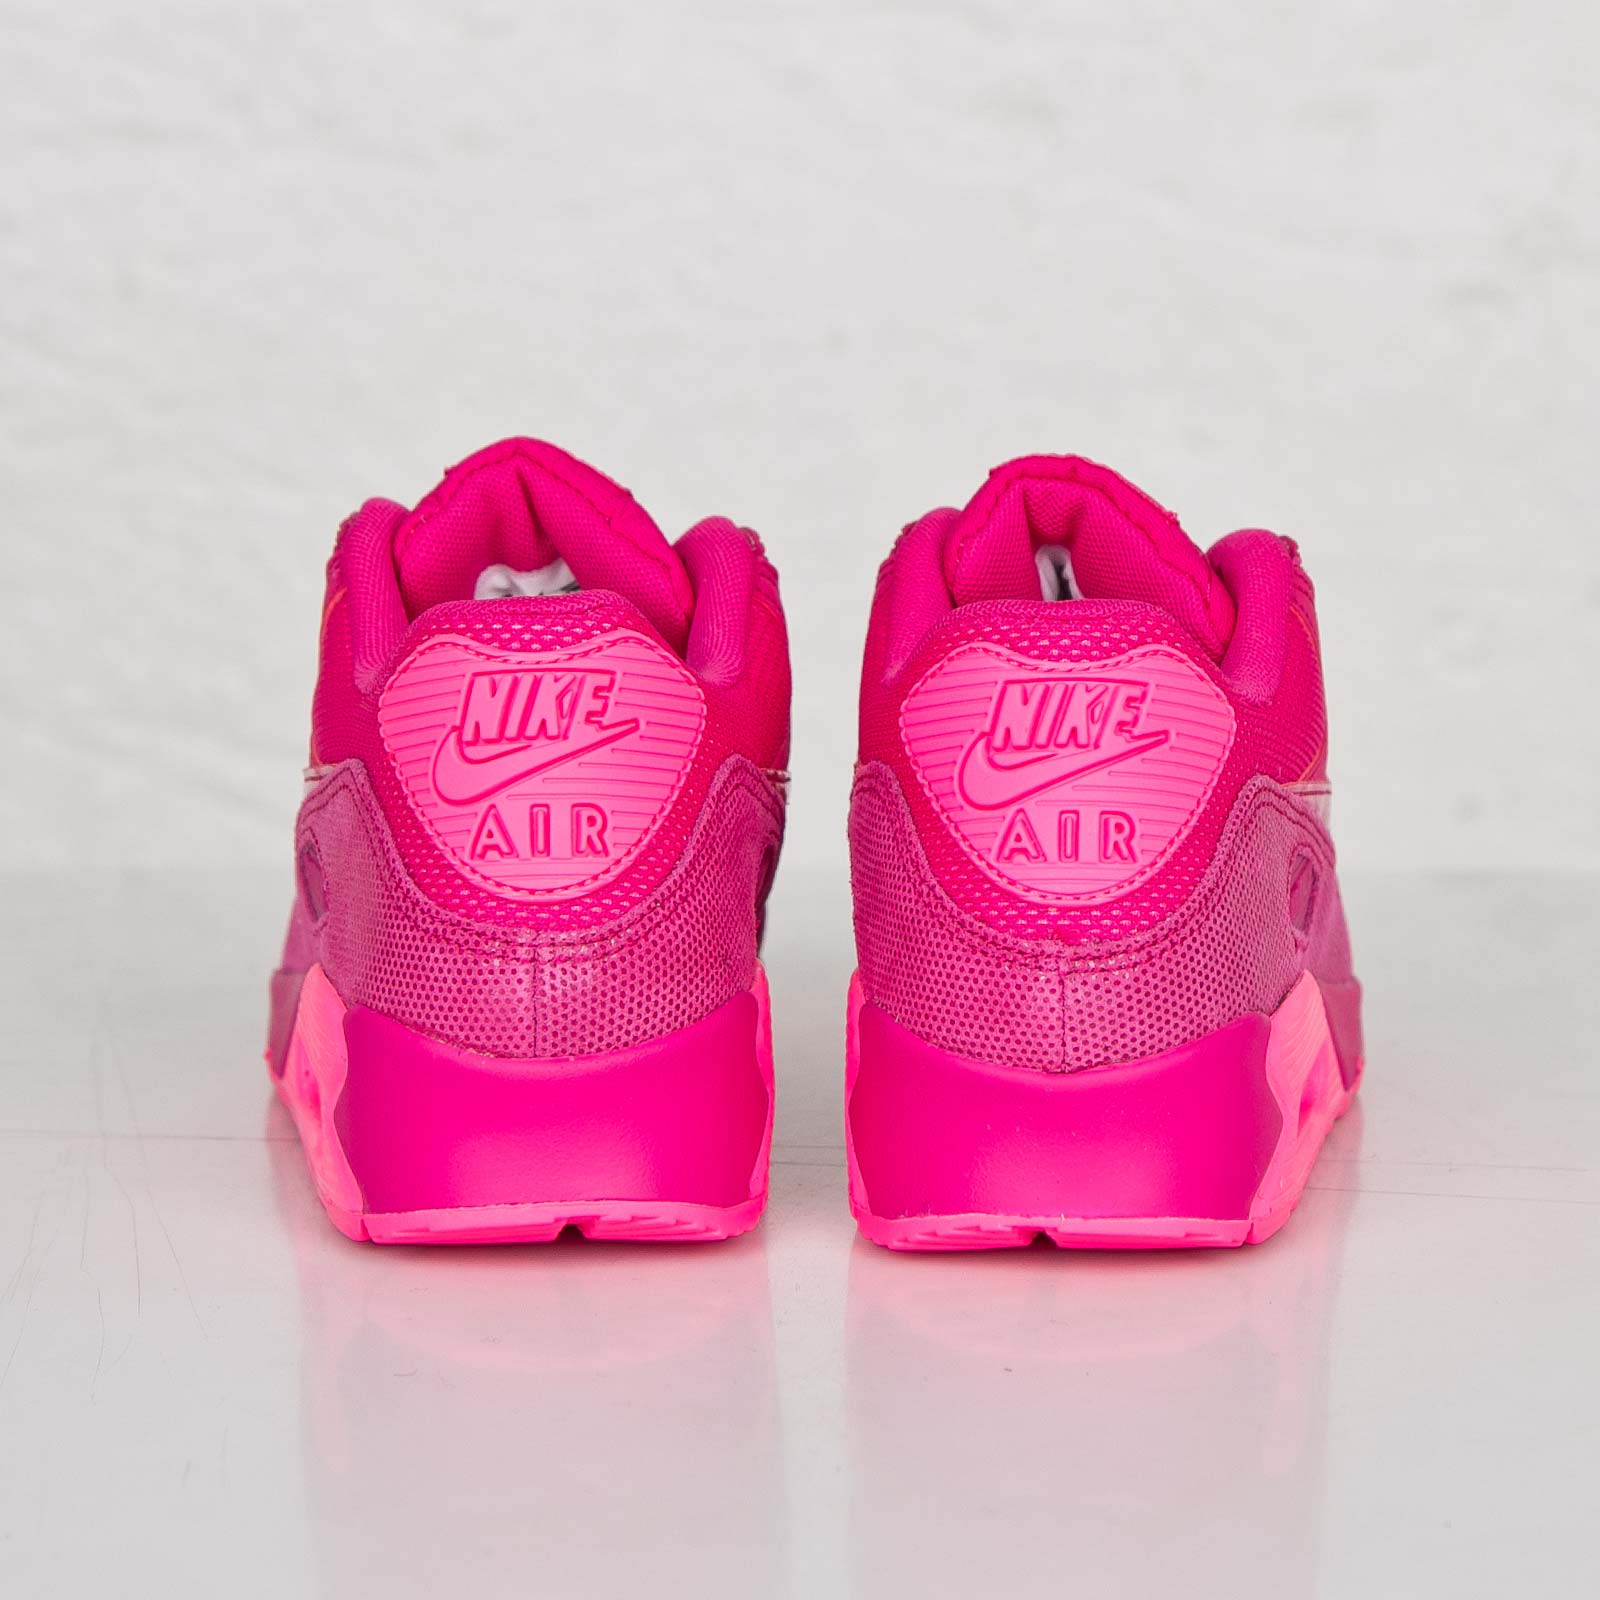 Nike Wmns Air Max 90 Premium 443817 600 Sneakersnstuff